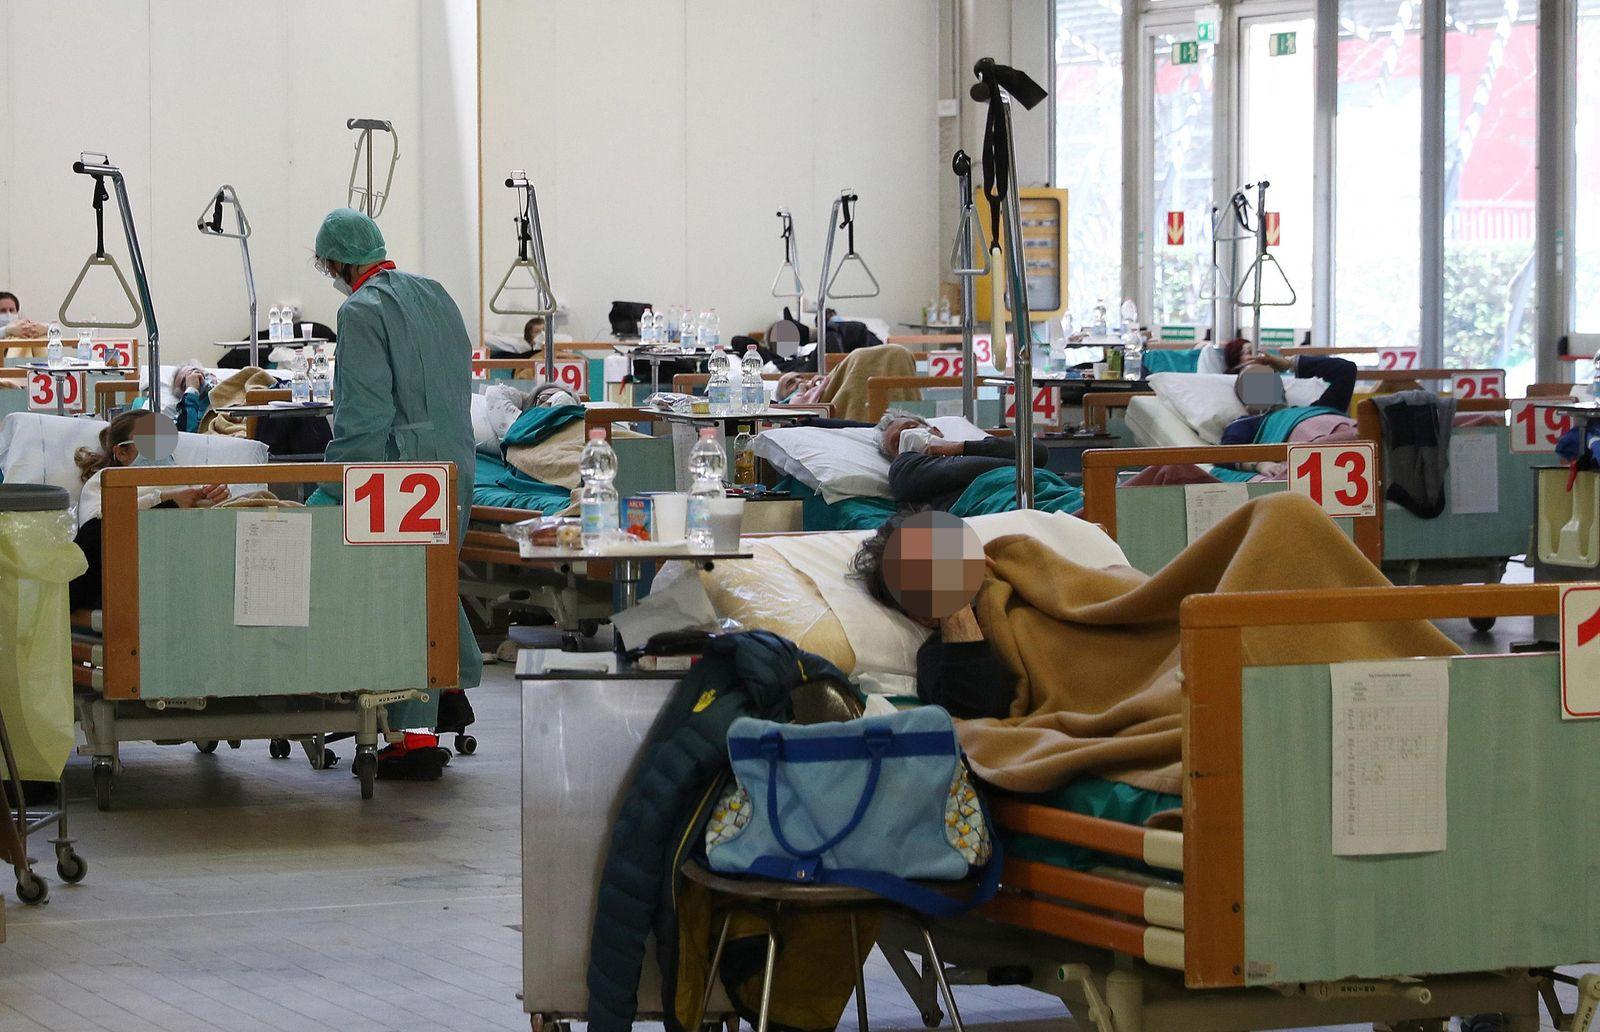 Coronavirus in Italy, Brescia - 24 Mar 2020